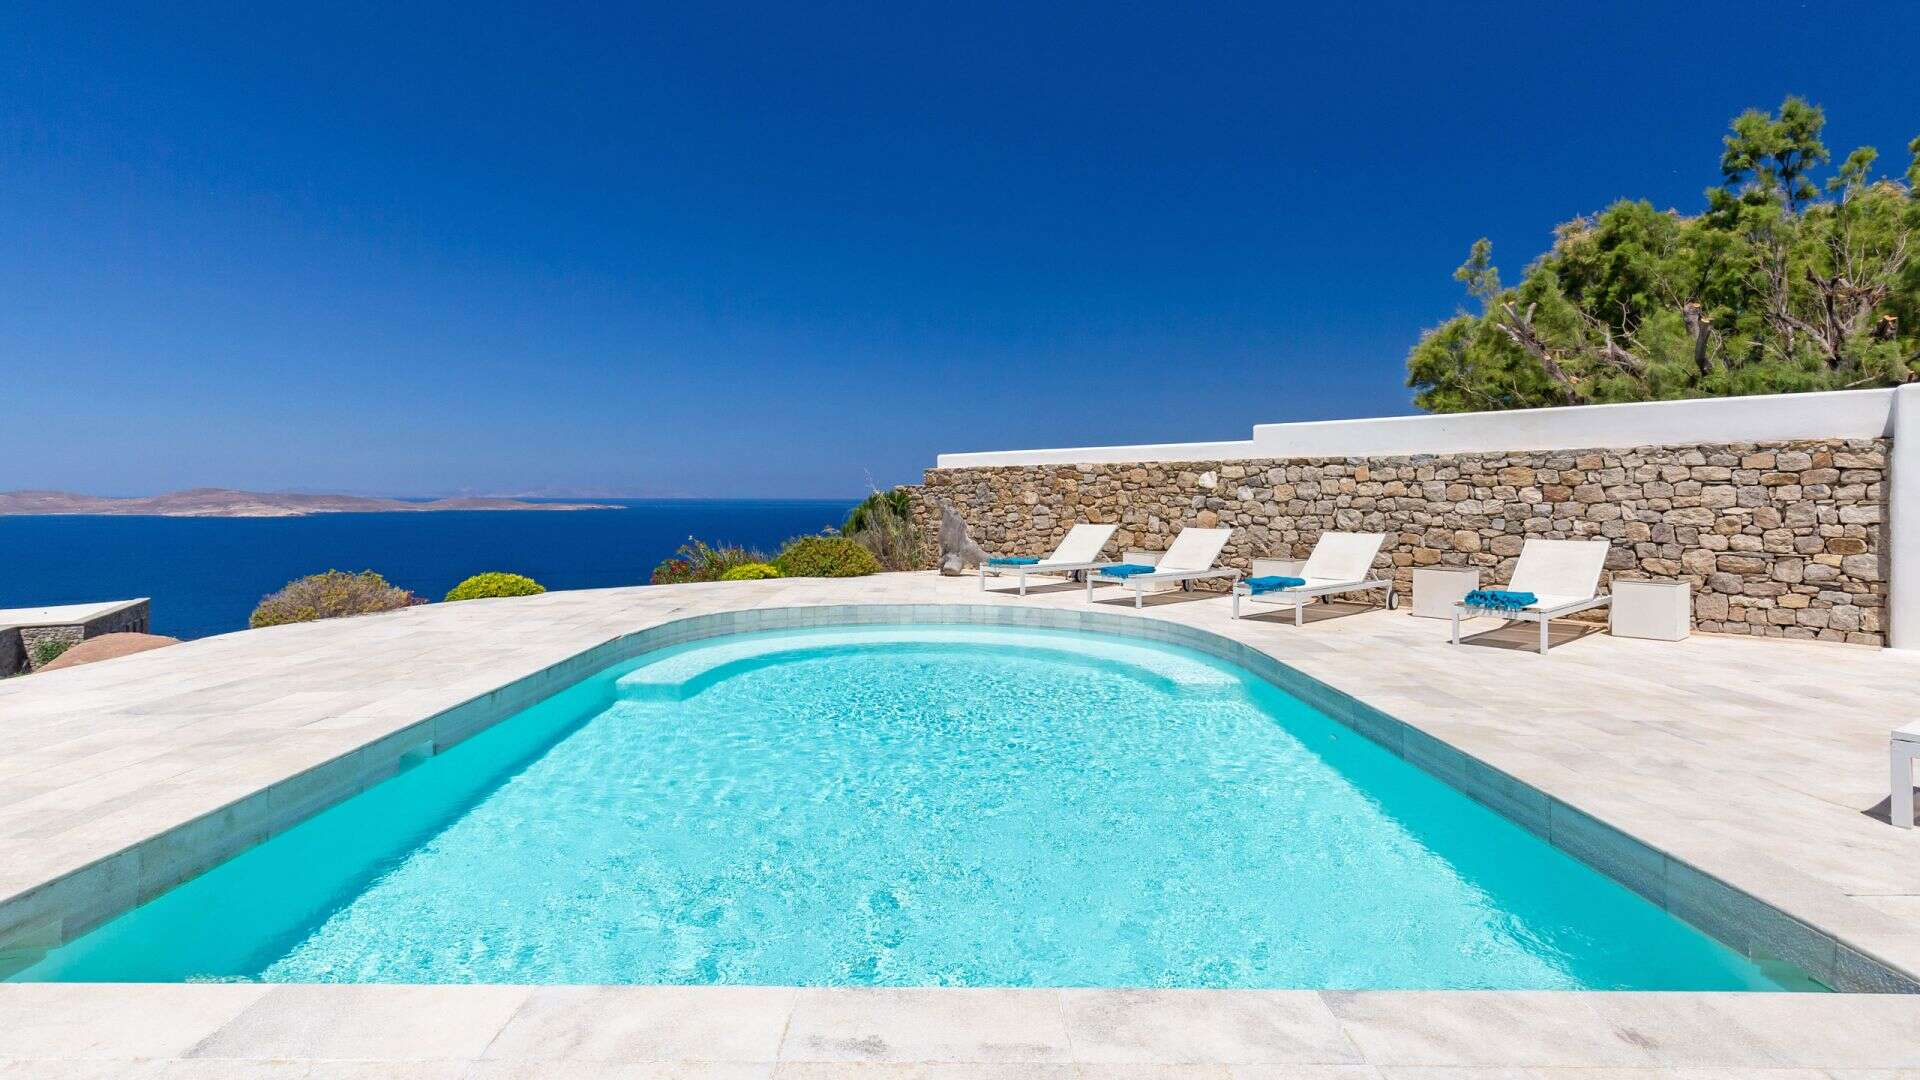 Luxury vacation rentals europe - Greece - Mykonos - Ano diakoftis - La Voile Rouge - Image 1/21